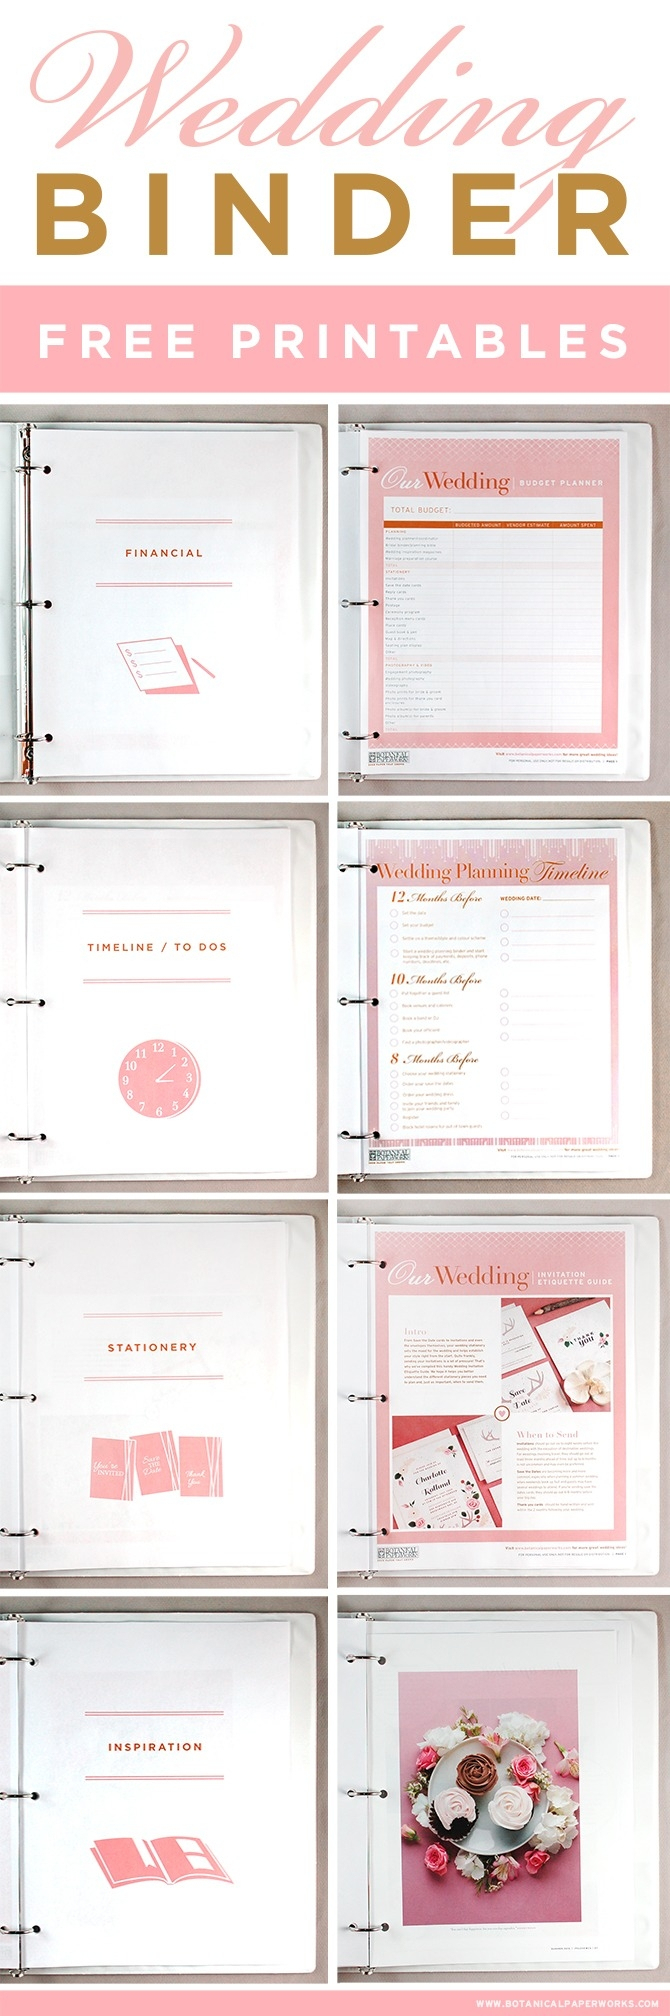 Free Printable Wedding Planner Book | Bestprintable231118 - Free Printable Wedding Planner Book